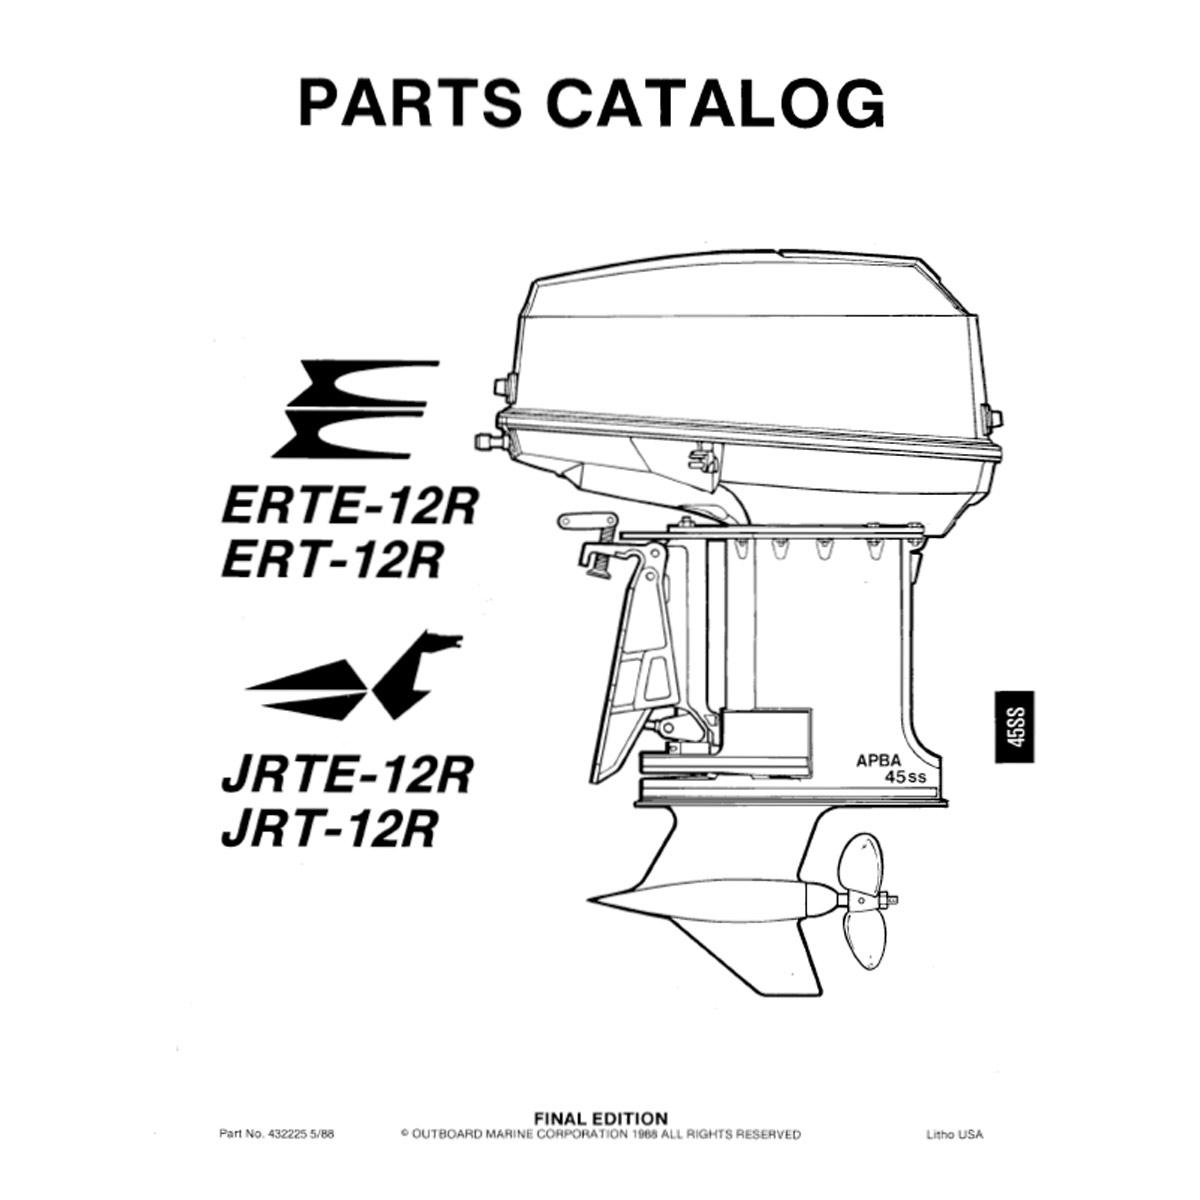 Seebold-Sports-Parts-Catalog-ERTE-12R